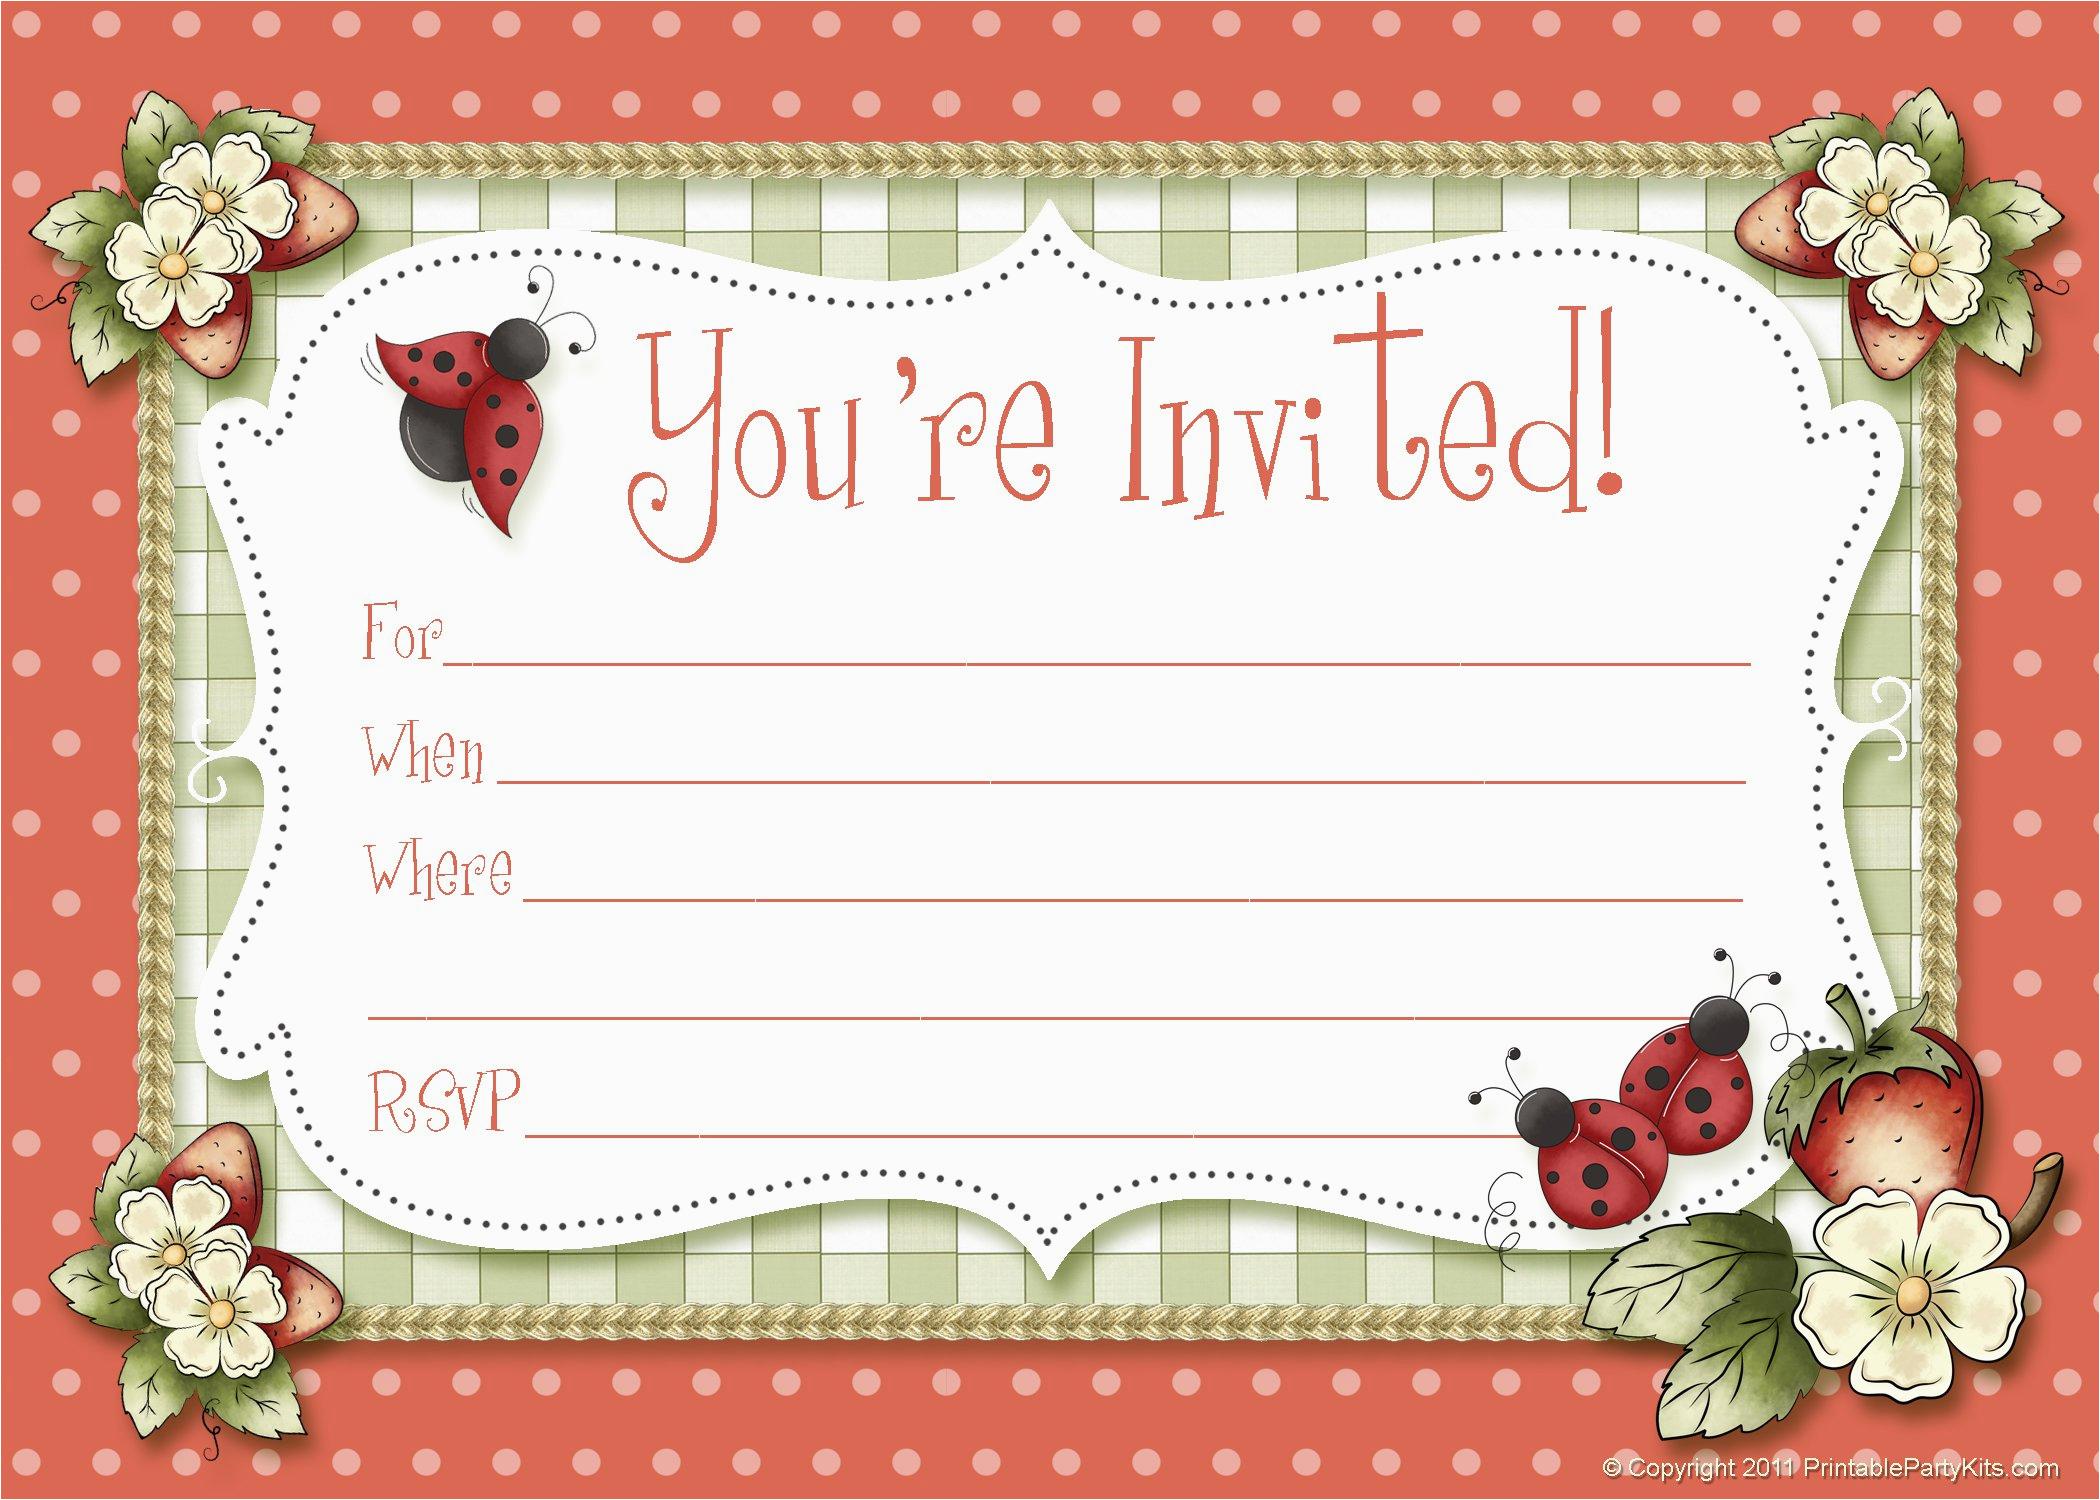 Free Birthday Invitation Maker with Photo Custom Birthday Invitation Birthday Invitation Maker